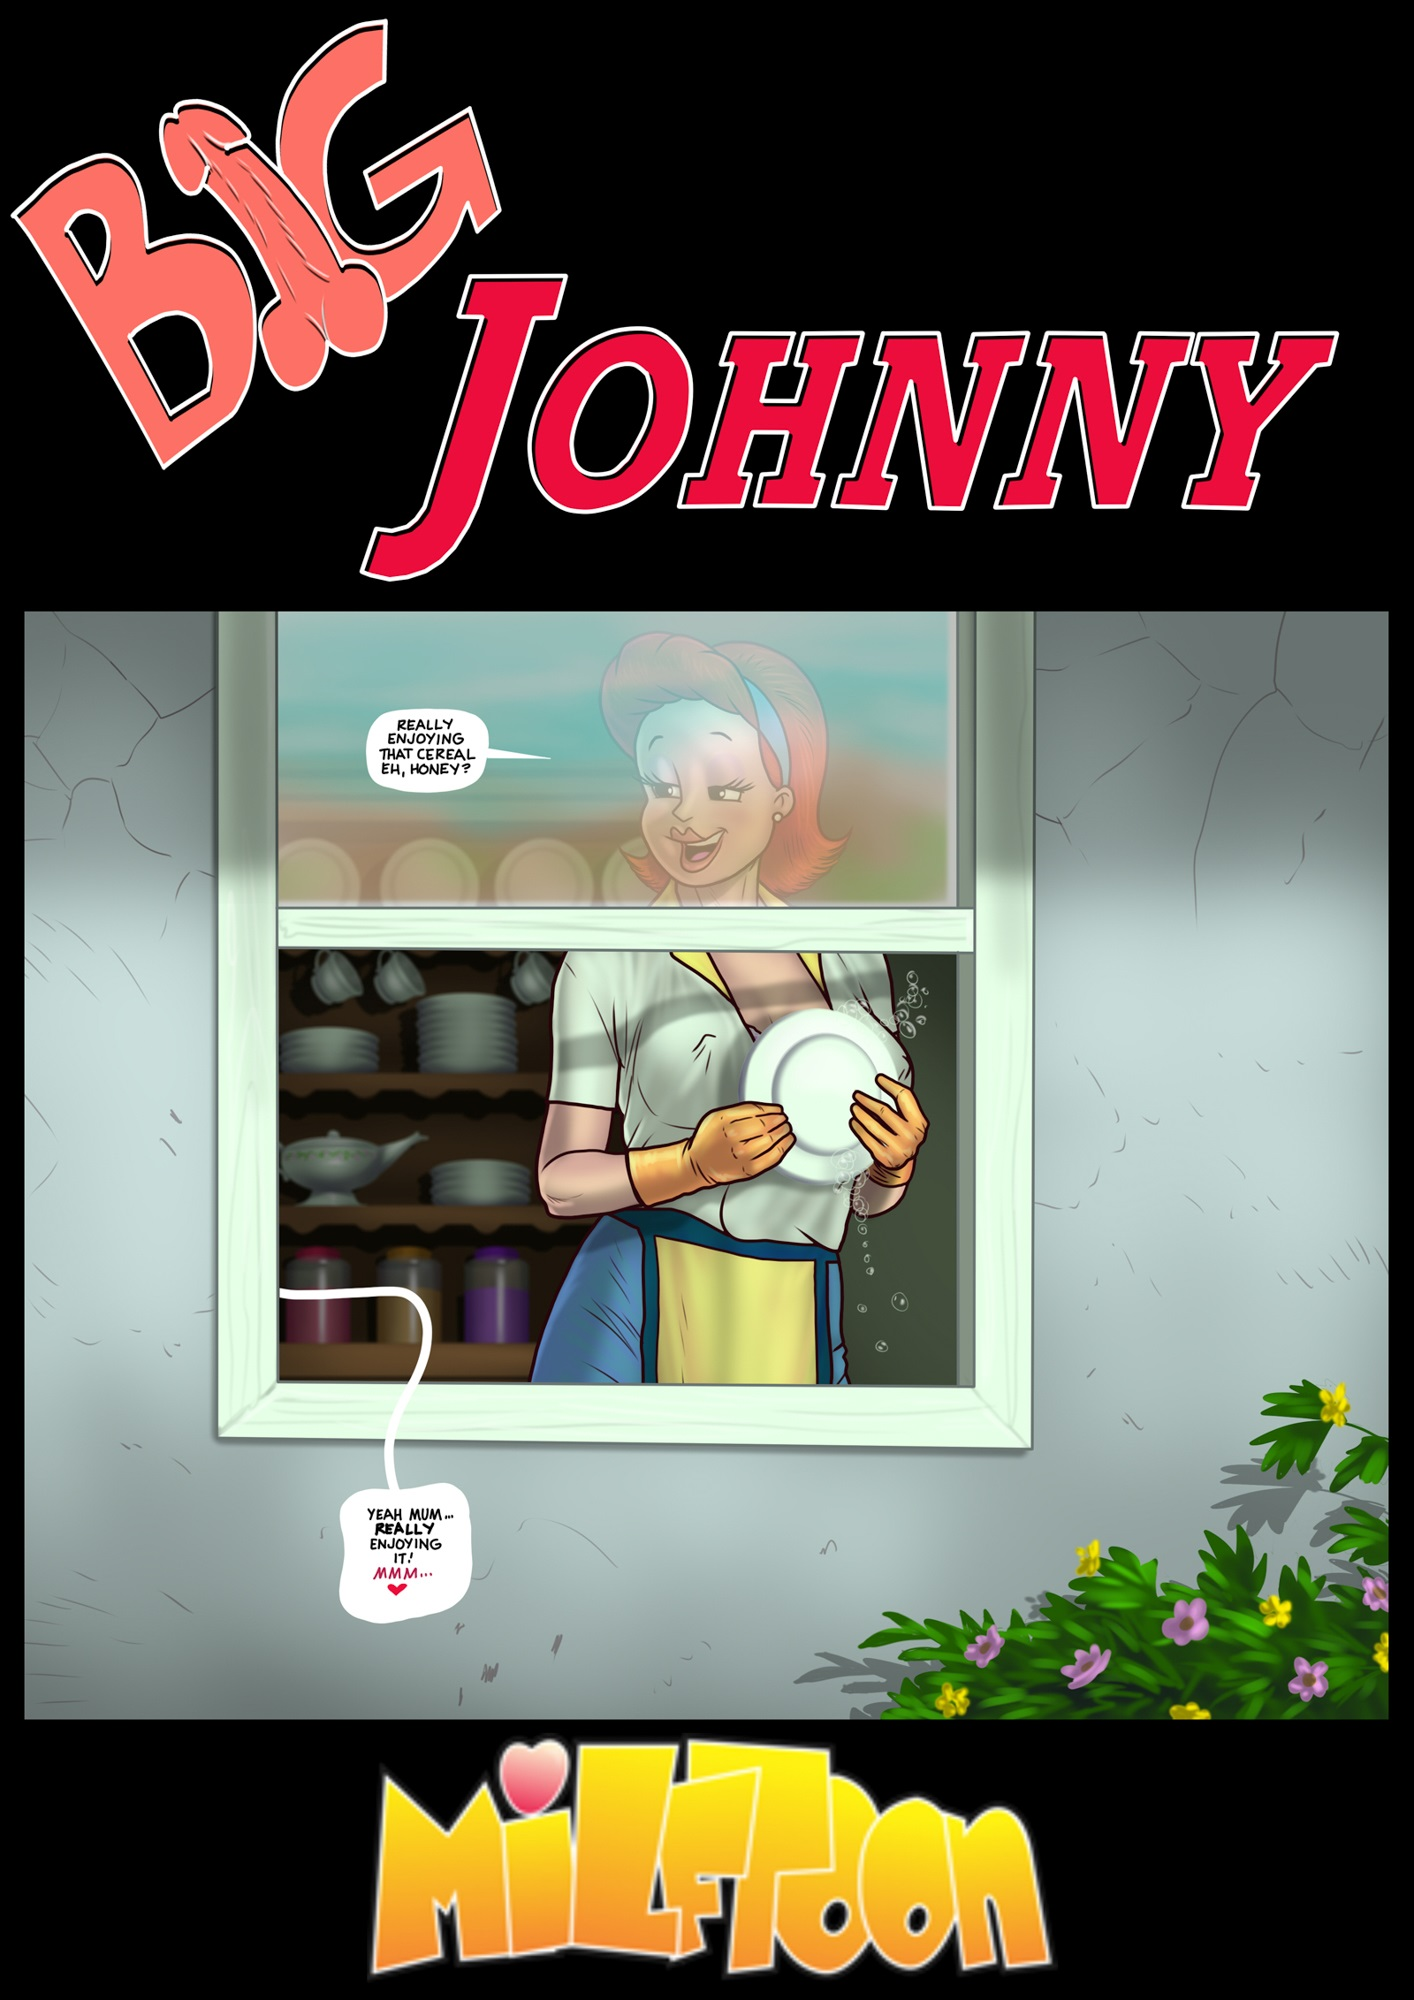 Milftoon- Big Johnny image 1